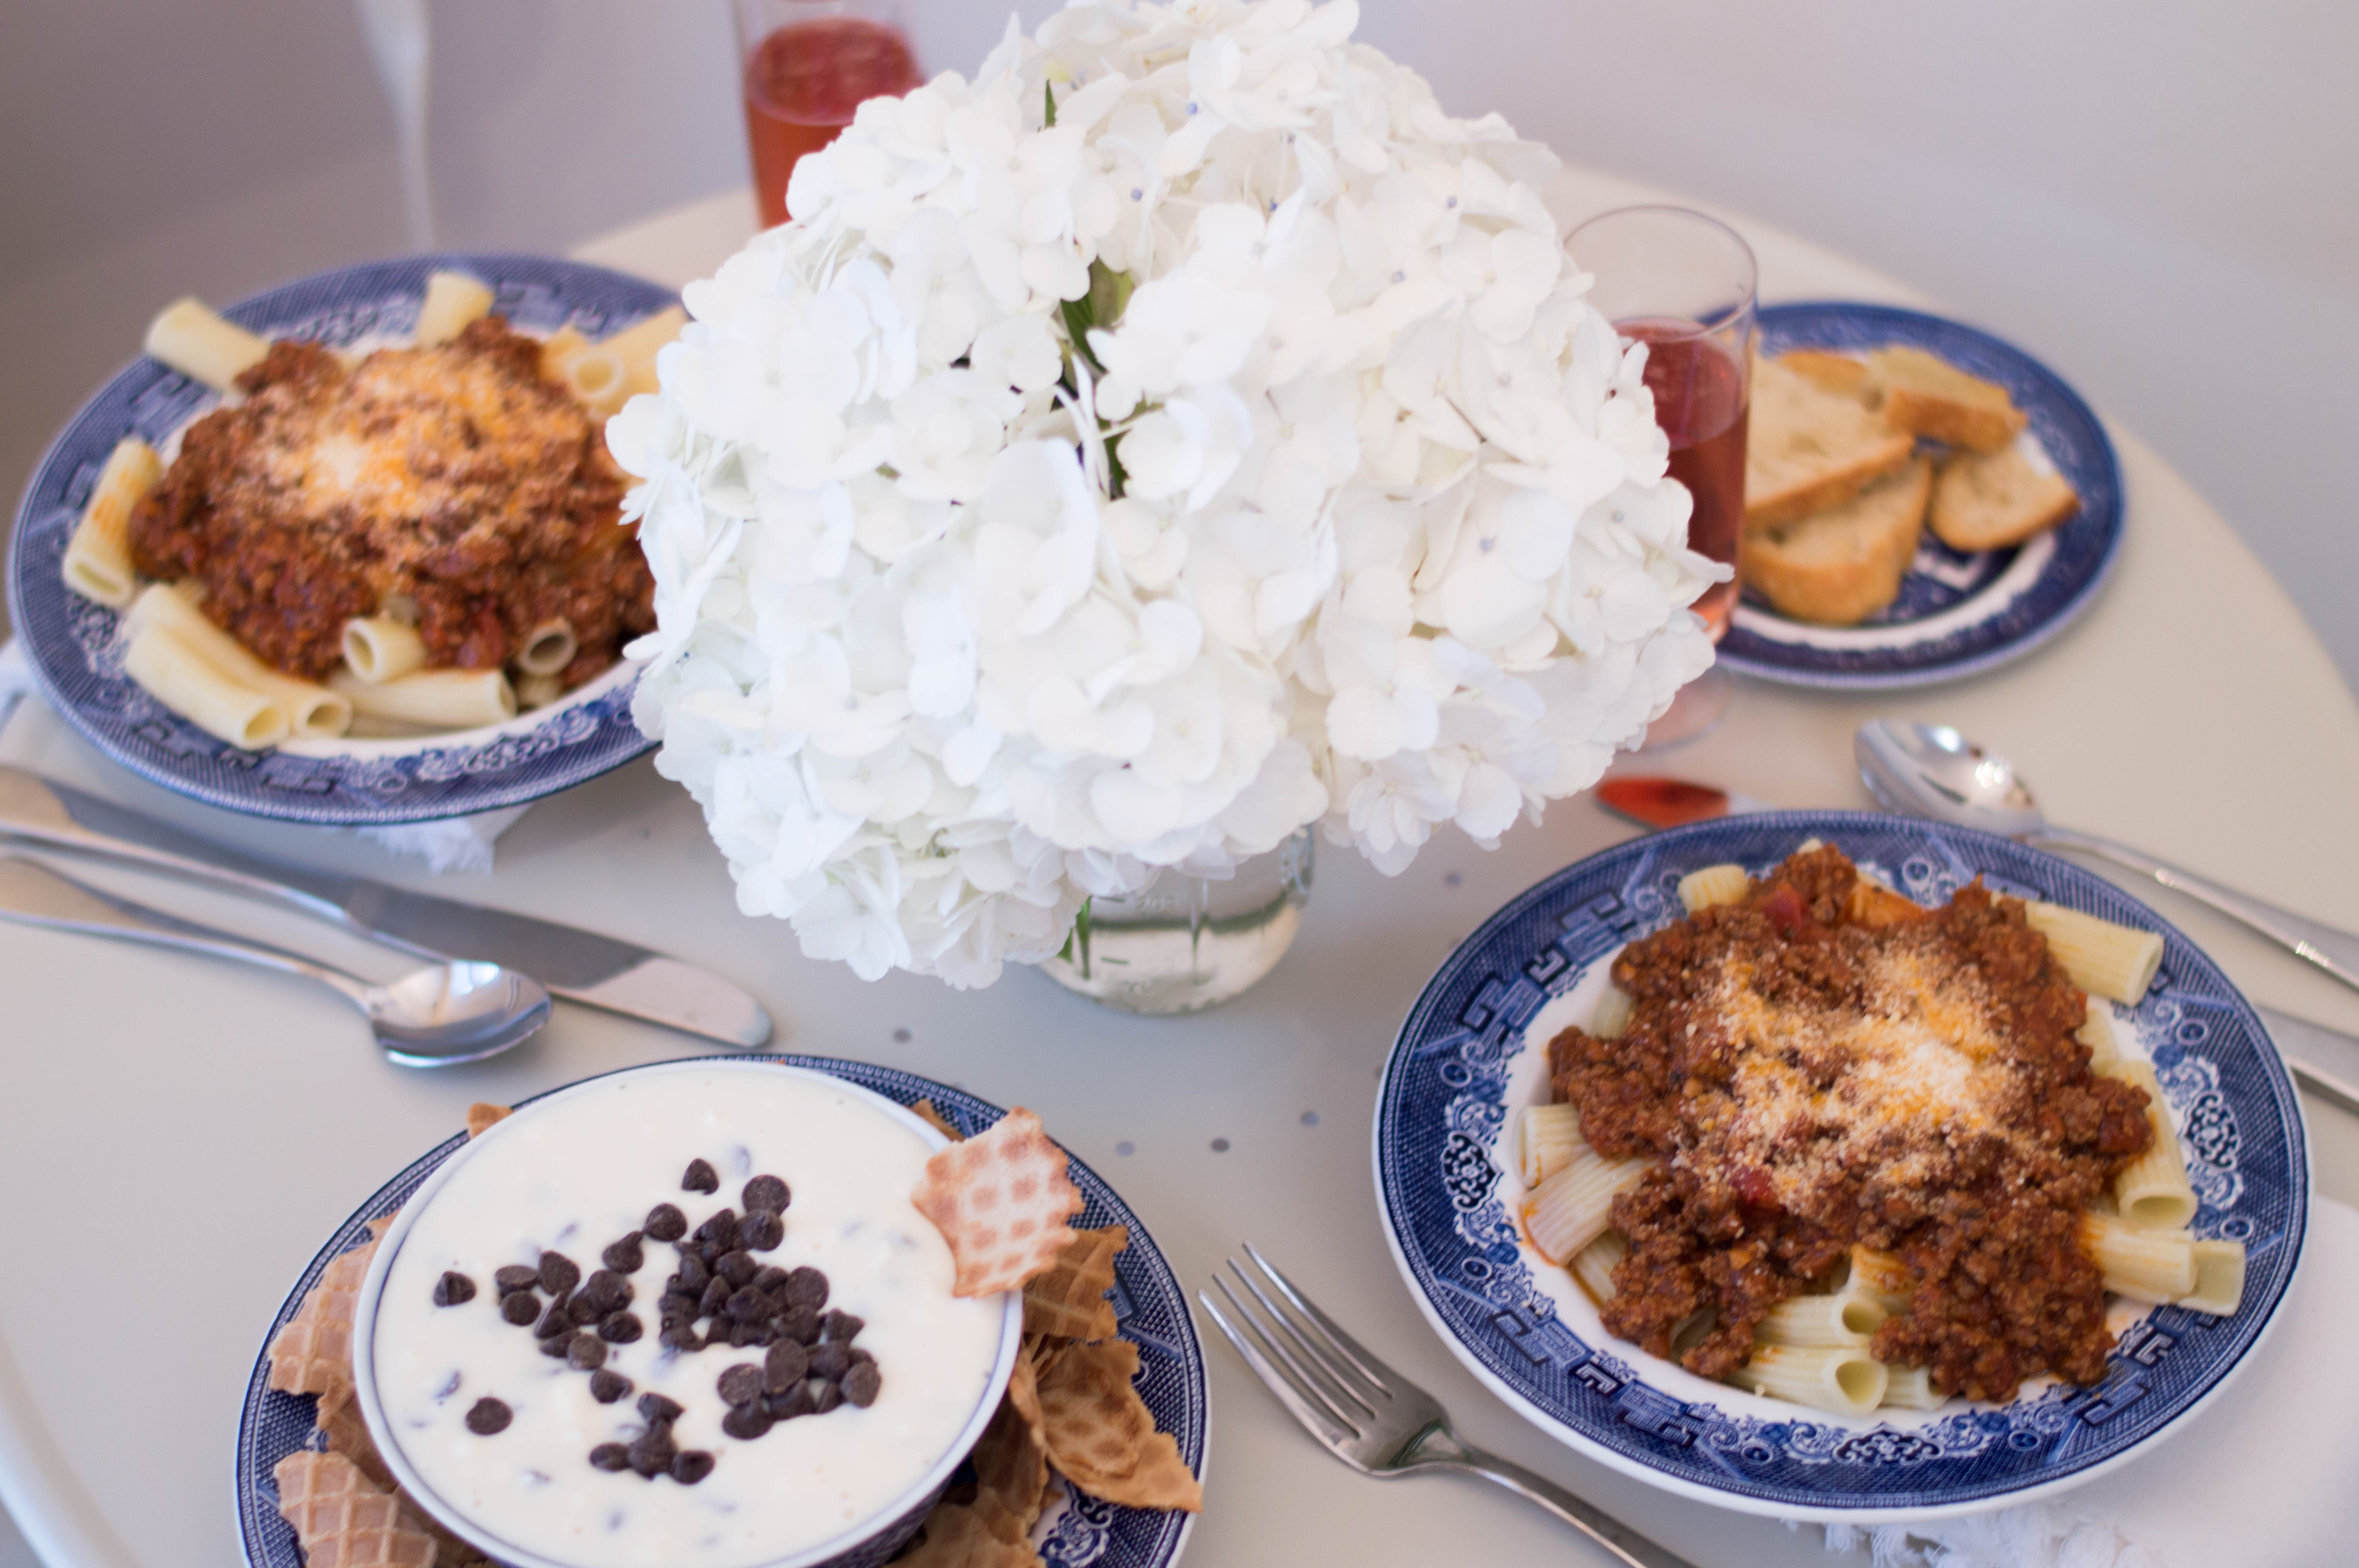 Easy Italian Dinner, Italian Recipes, Cannoli Dip, The Fresh Market